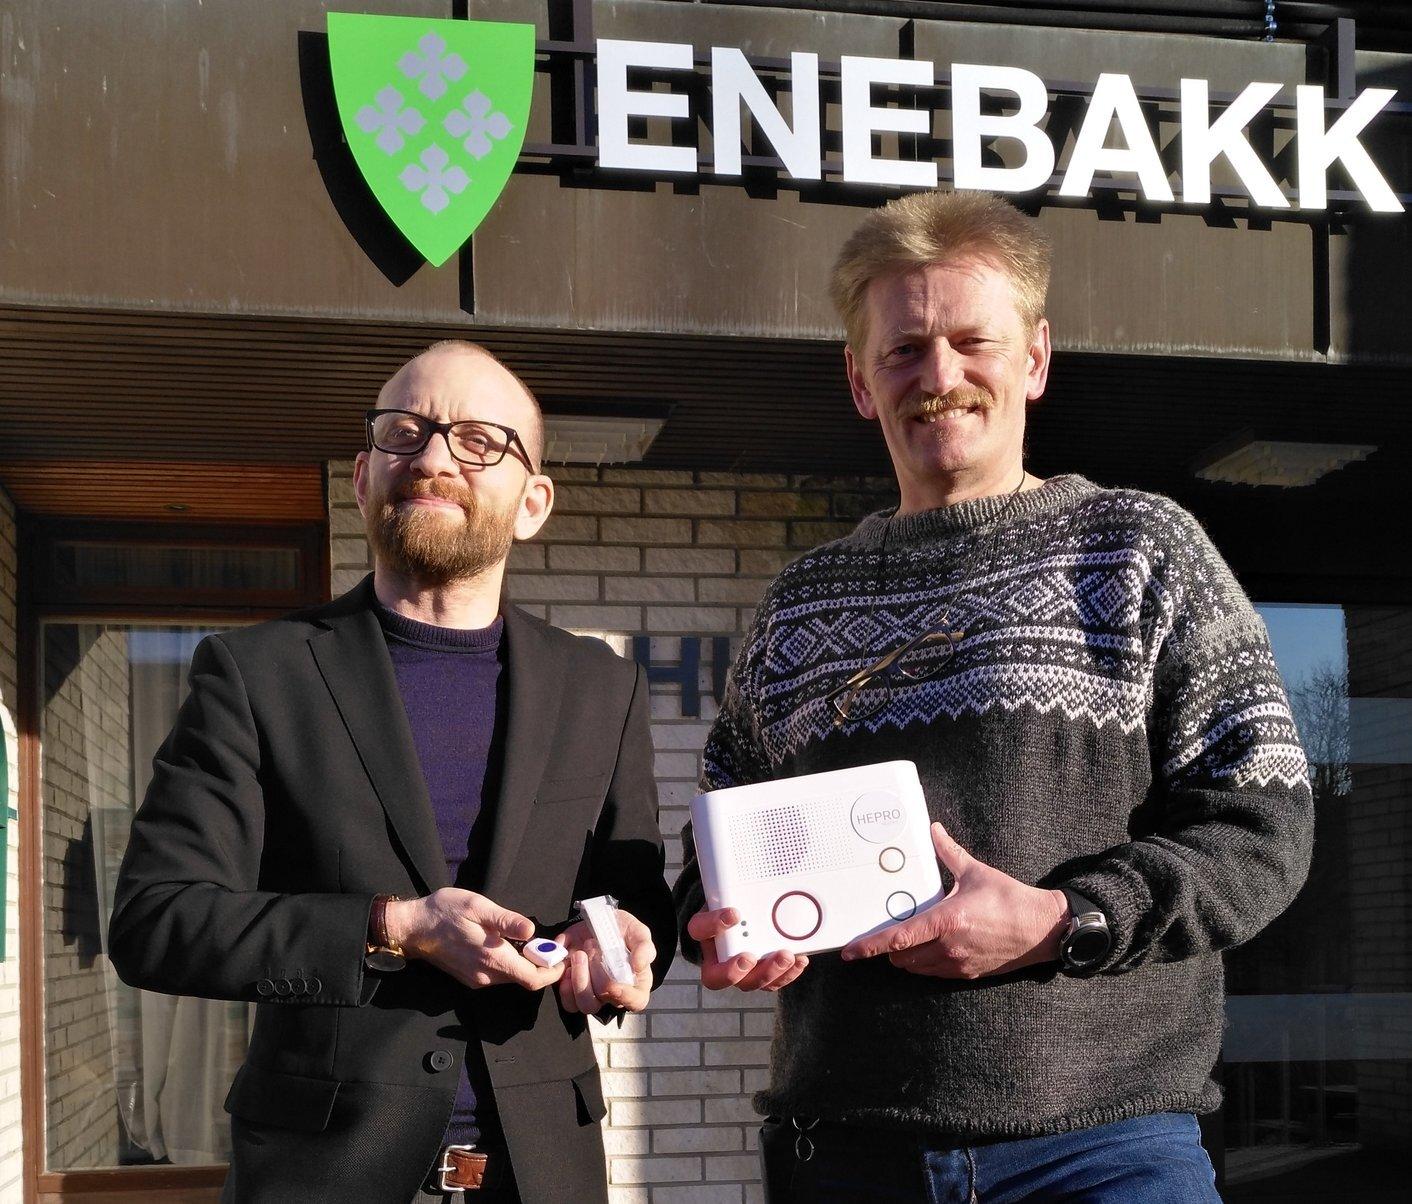 Velferdsteknologi - to menn foran kommunehuset holder en trygghetsalarm